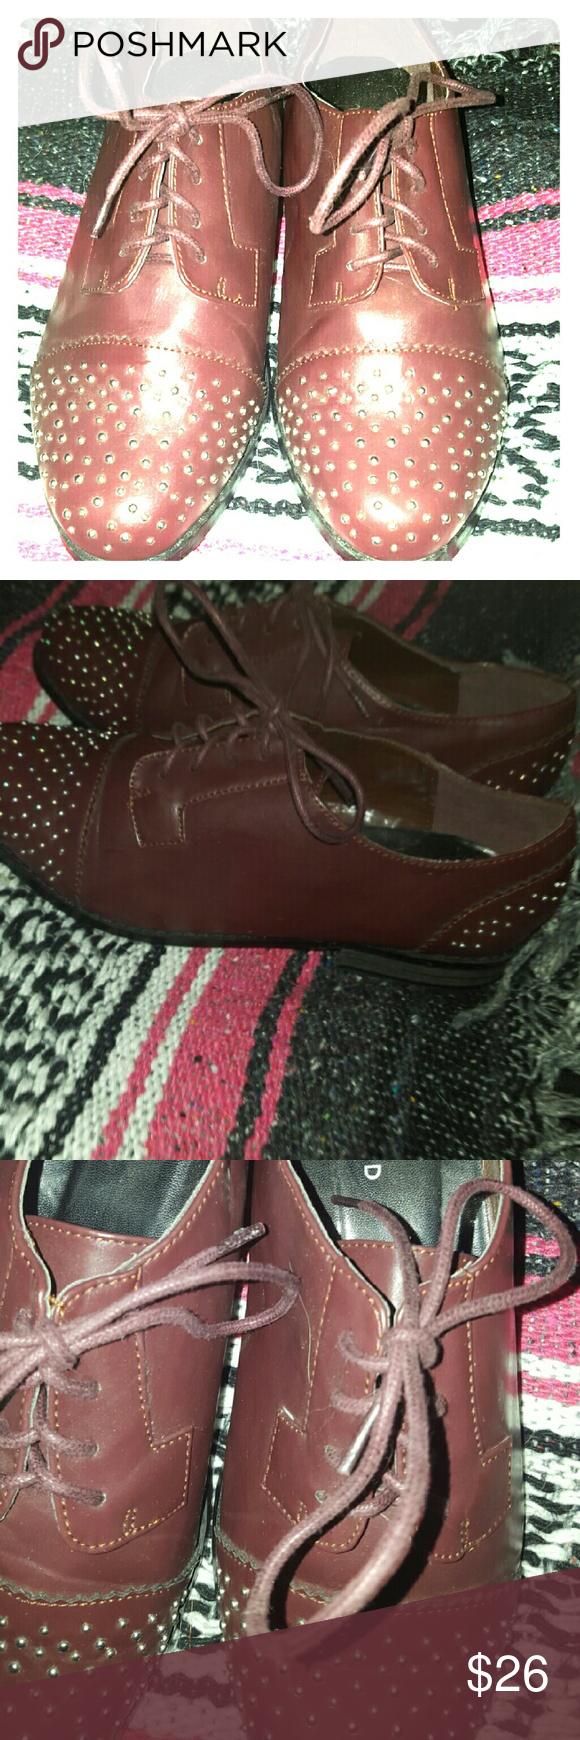 Torrid Oxford EUC.  Worn once. Nice plum undertone. Gold studs on toe. torrid Shoes Flats & Loafers